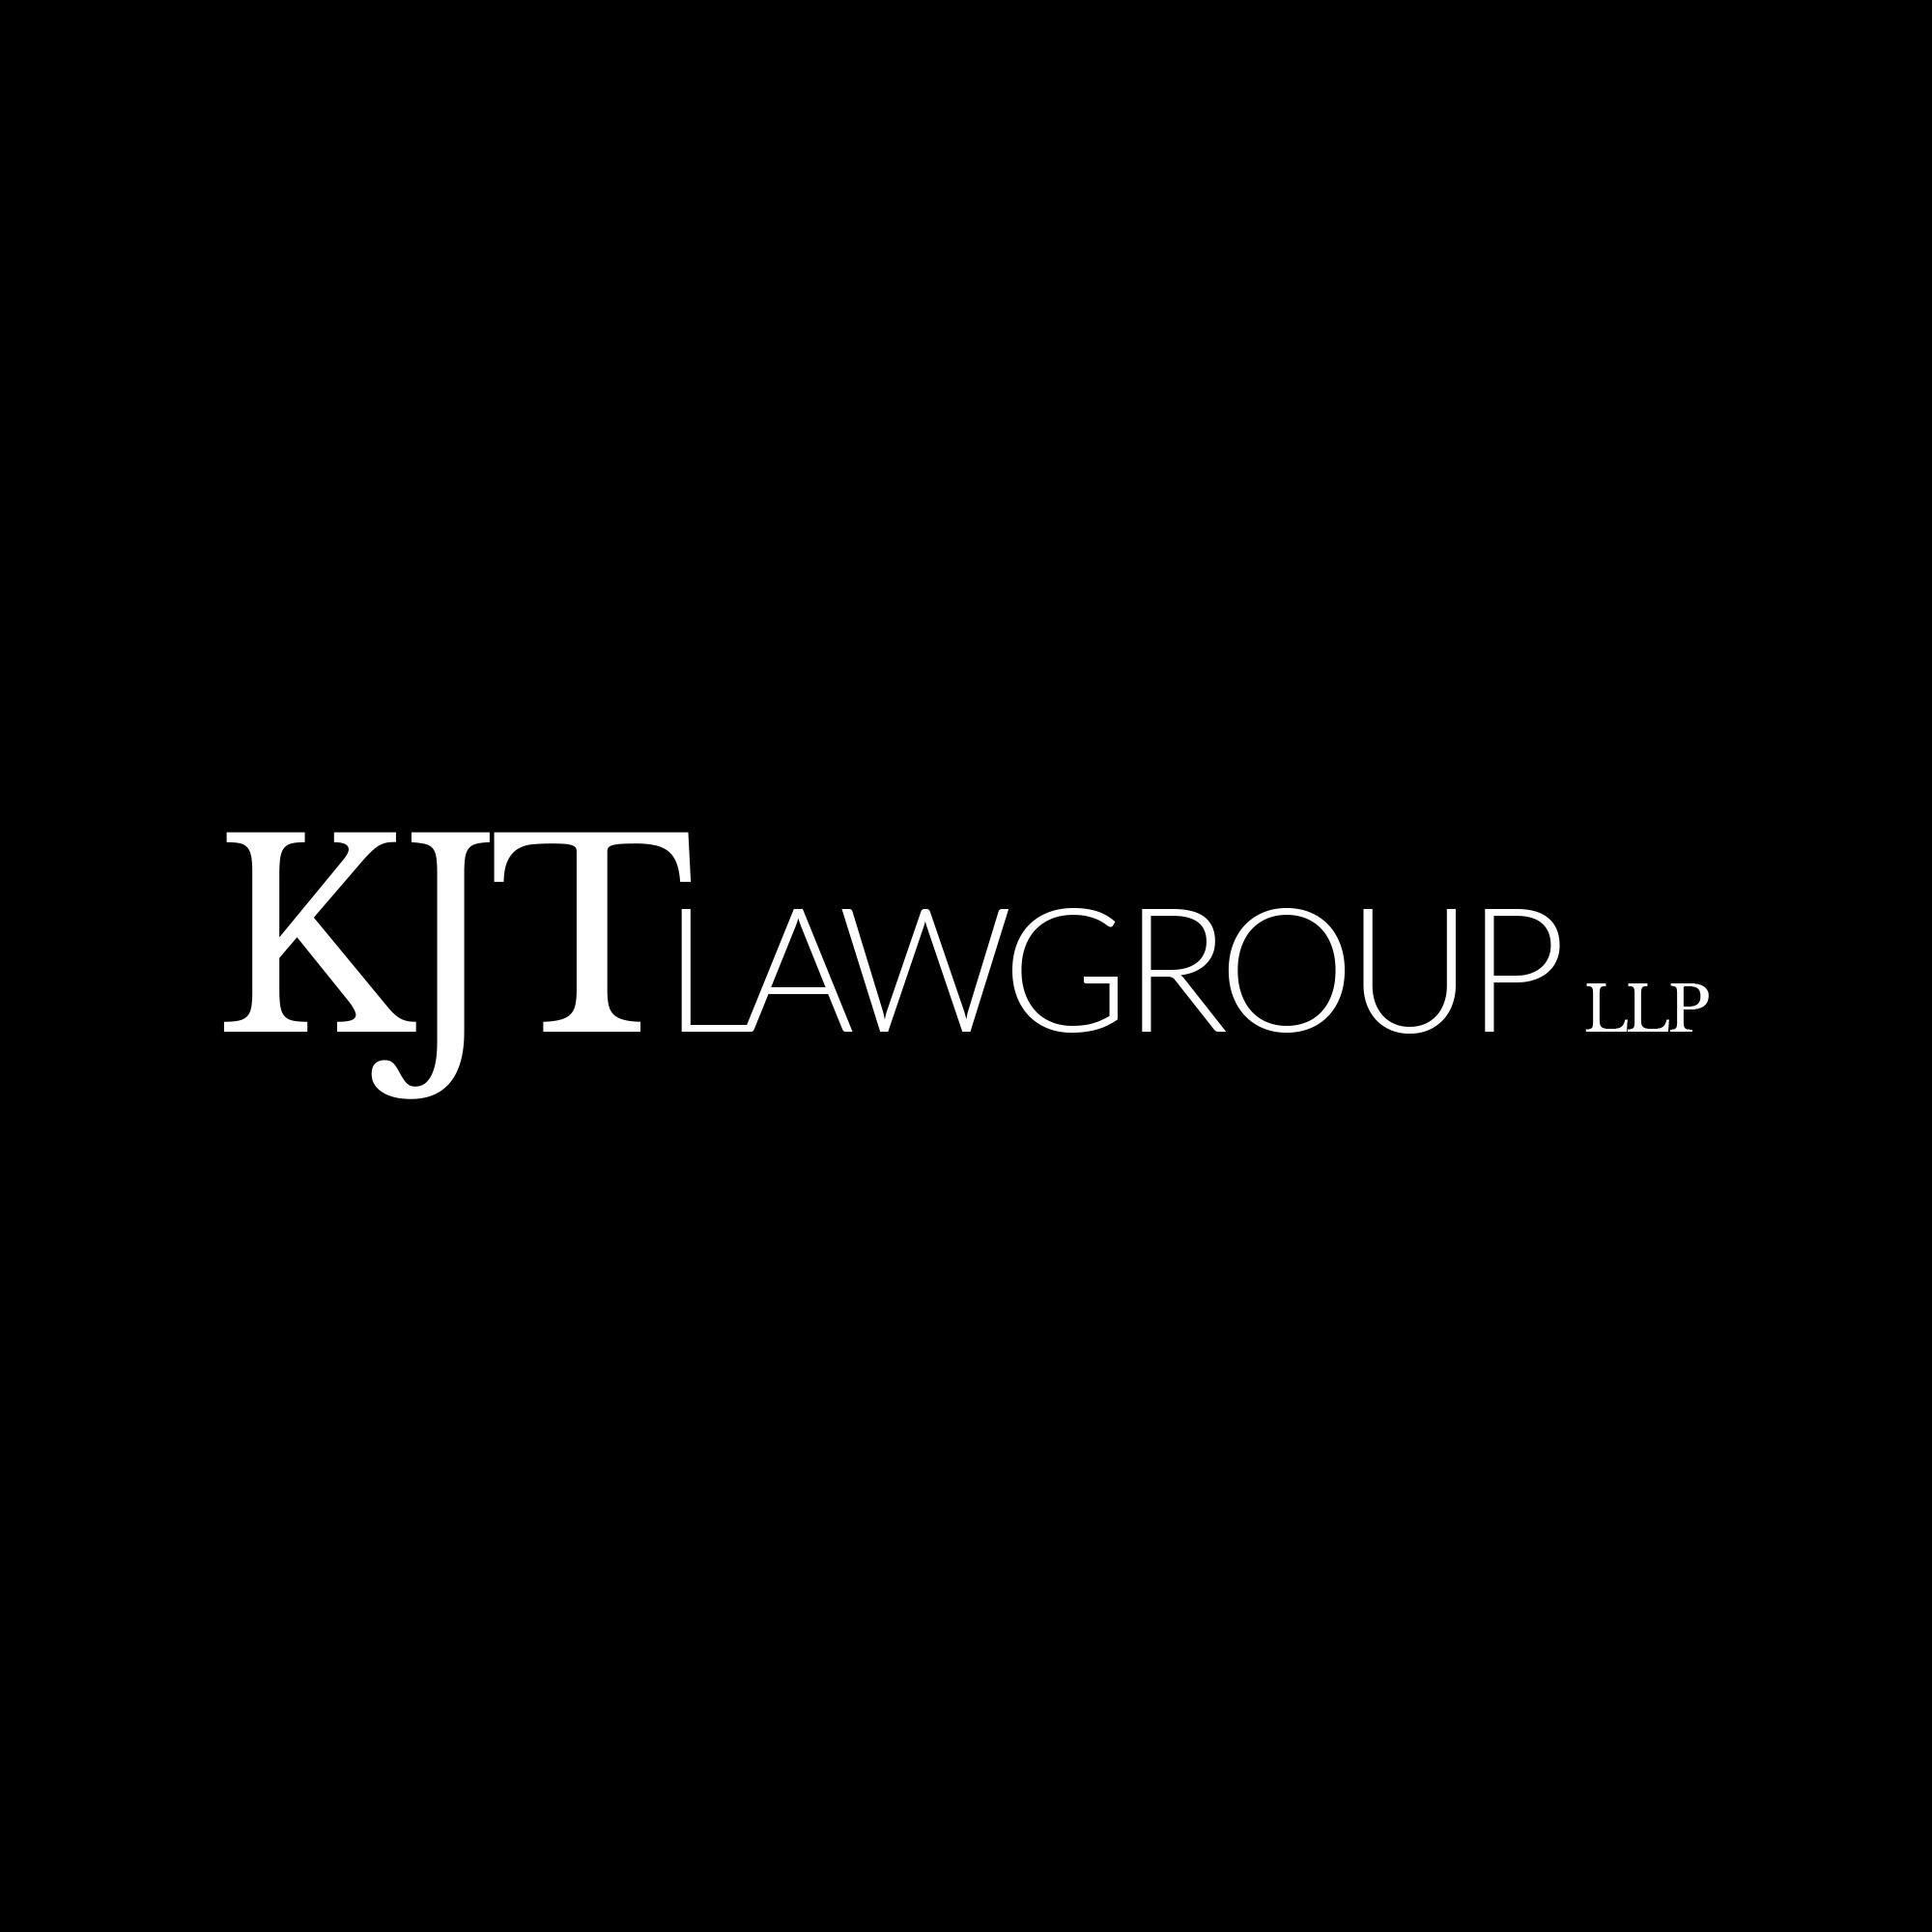 KJT Law Group LLP